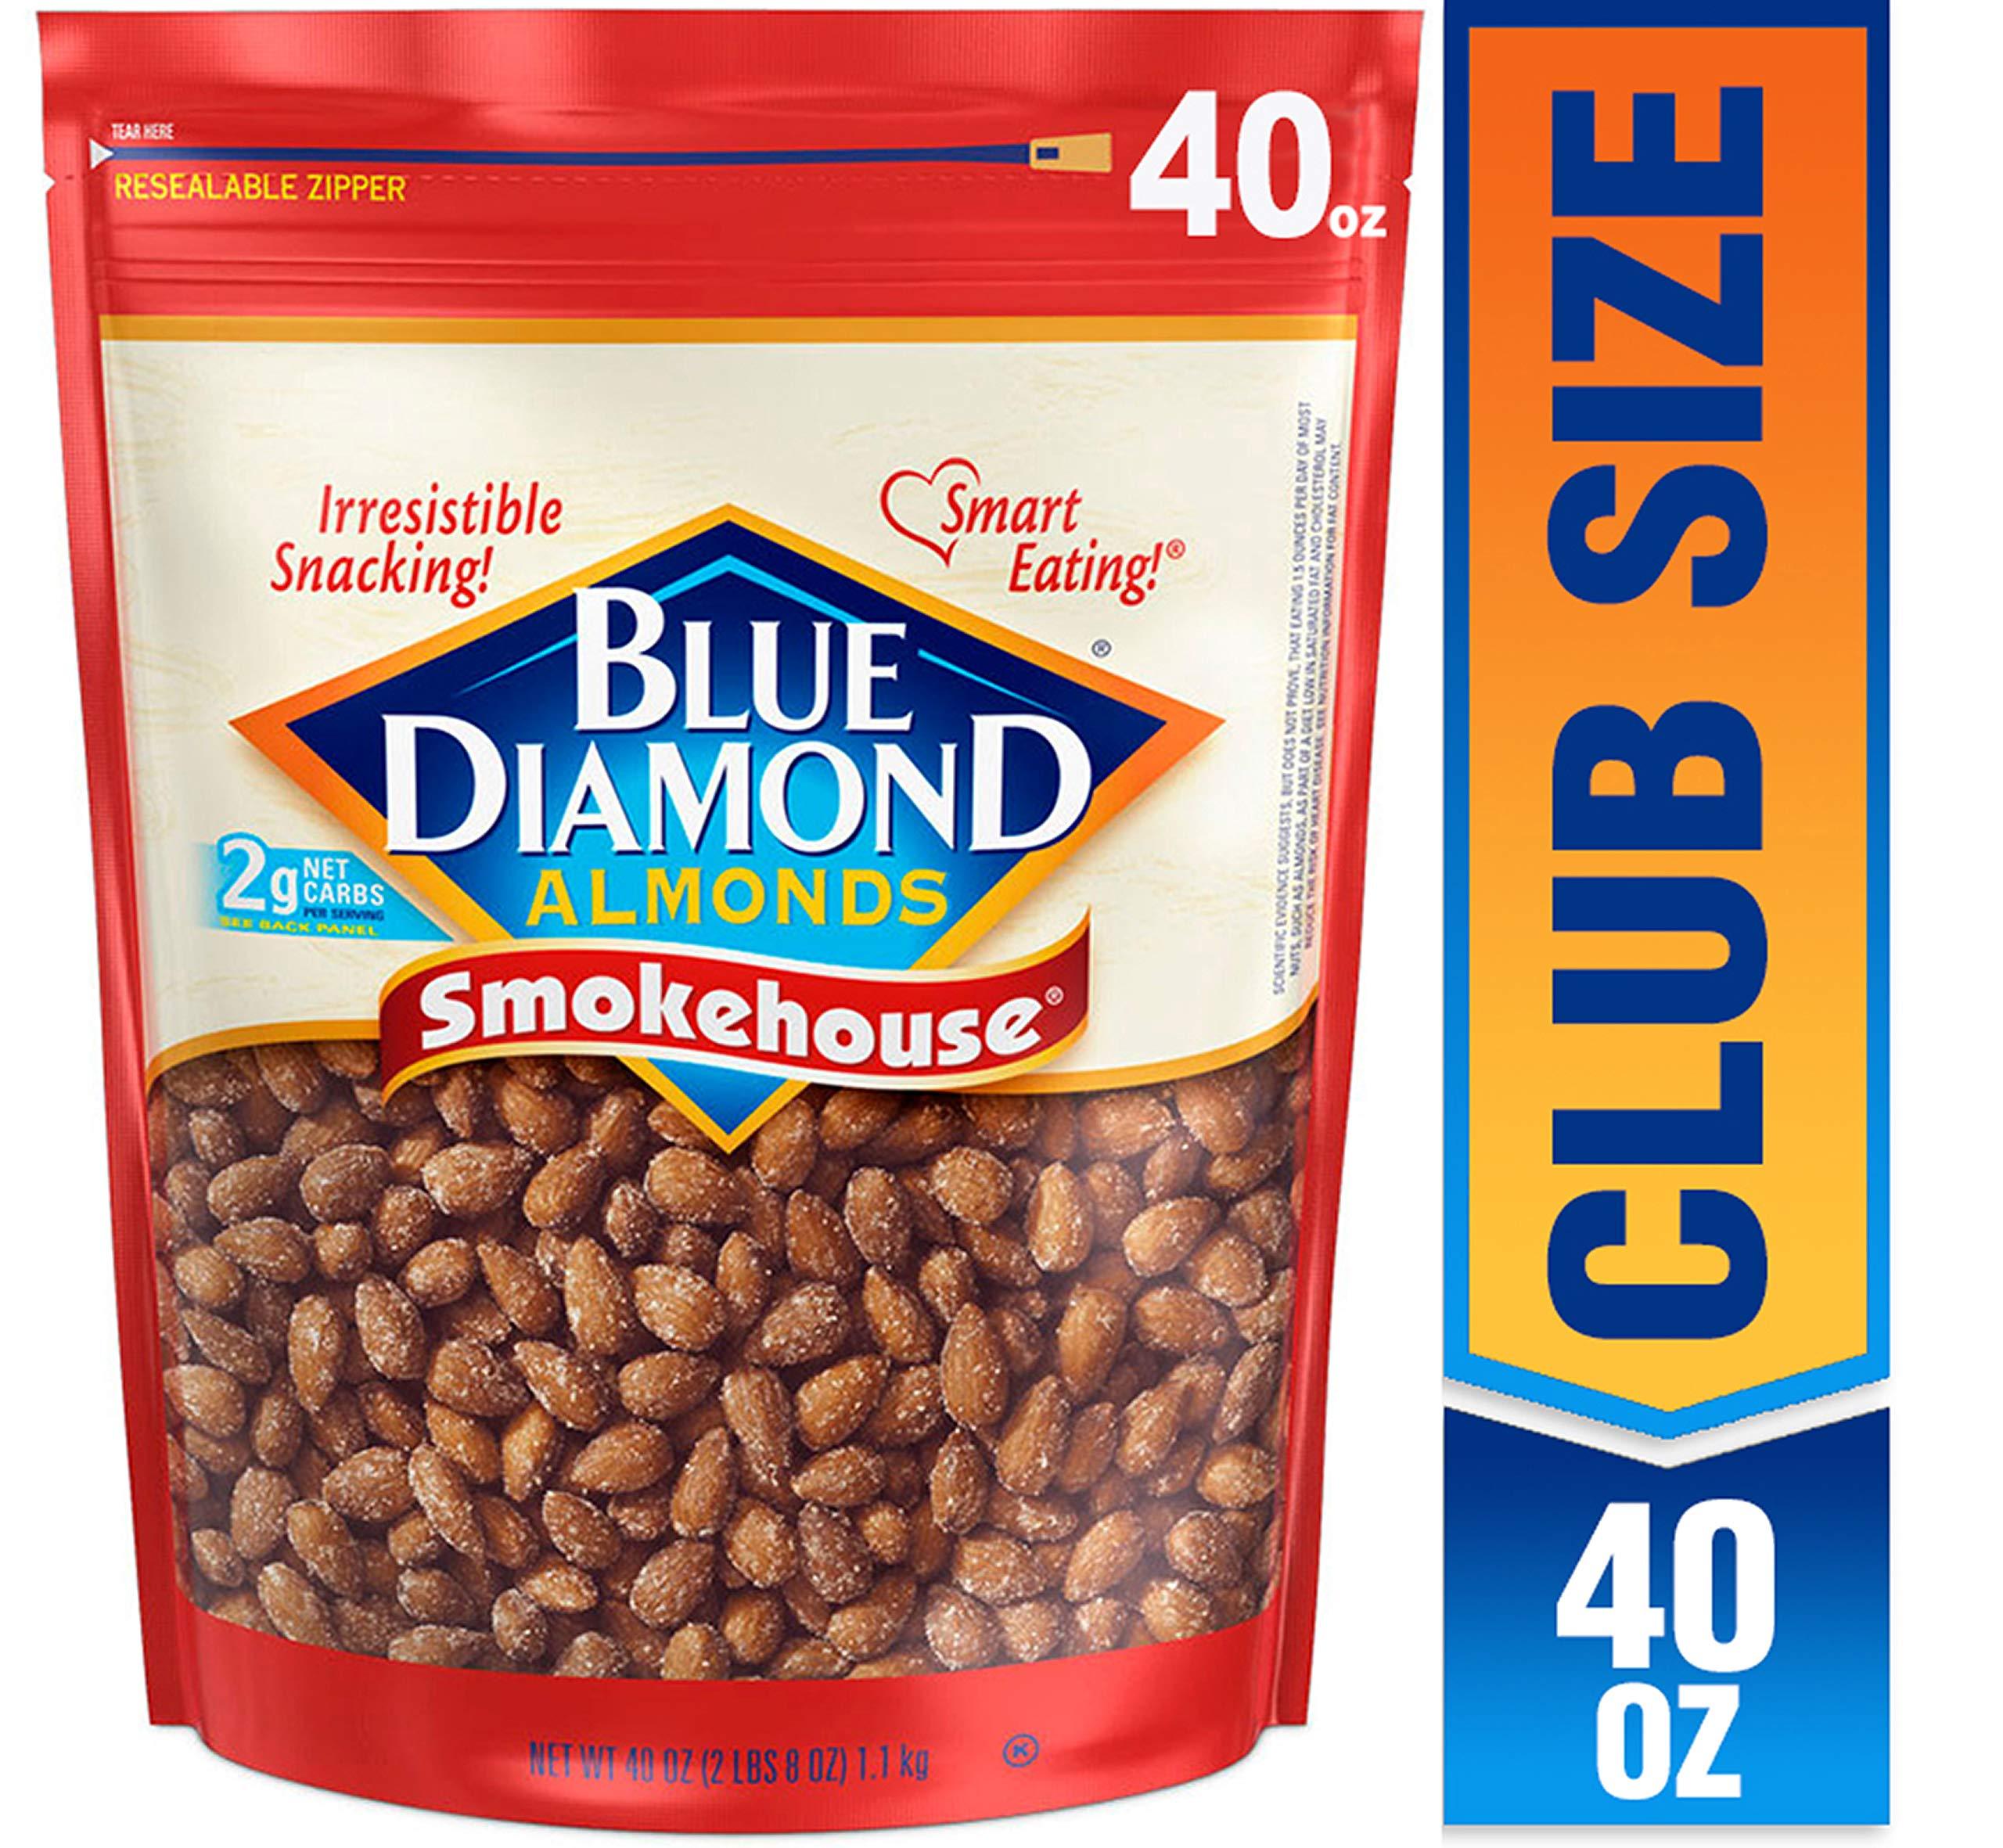 Blue Diamond Almonds, Smokehouse, by Blue Diamond Almonds